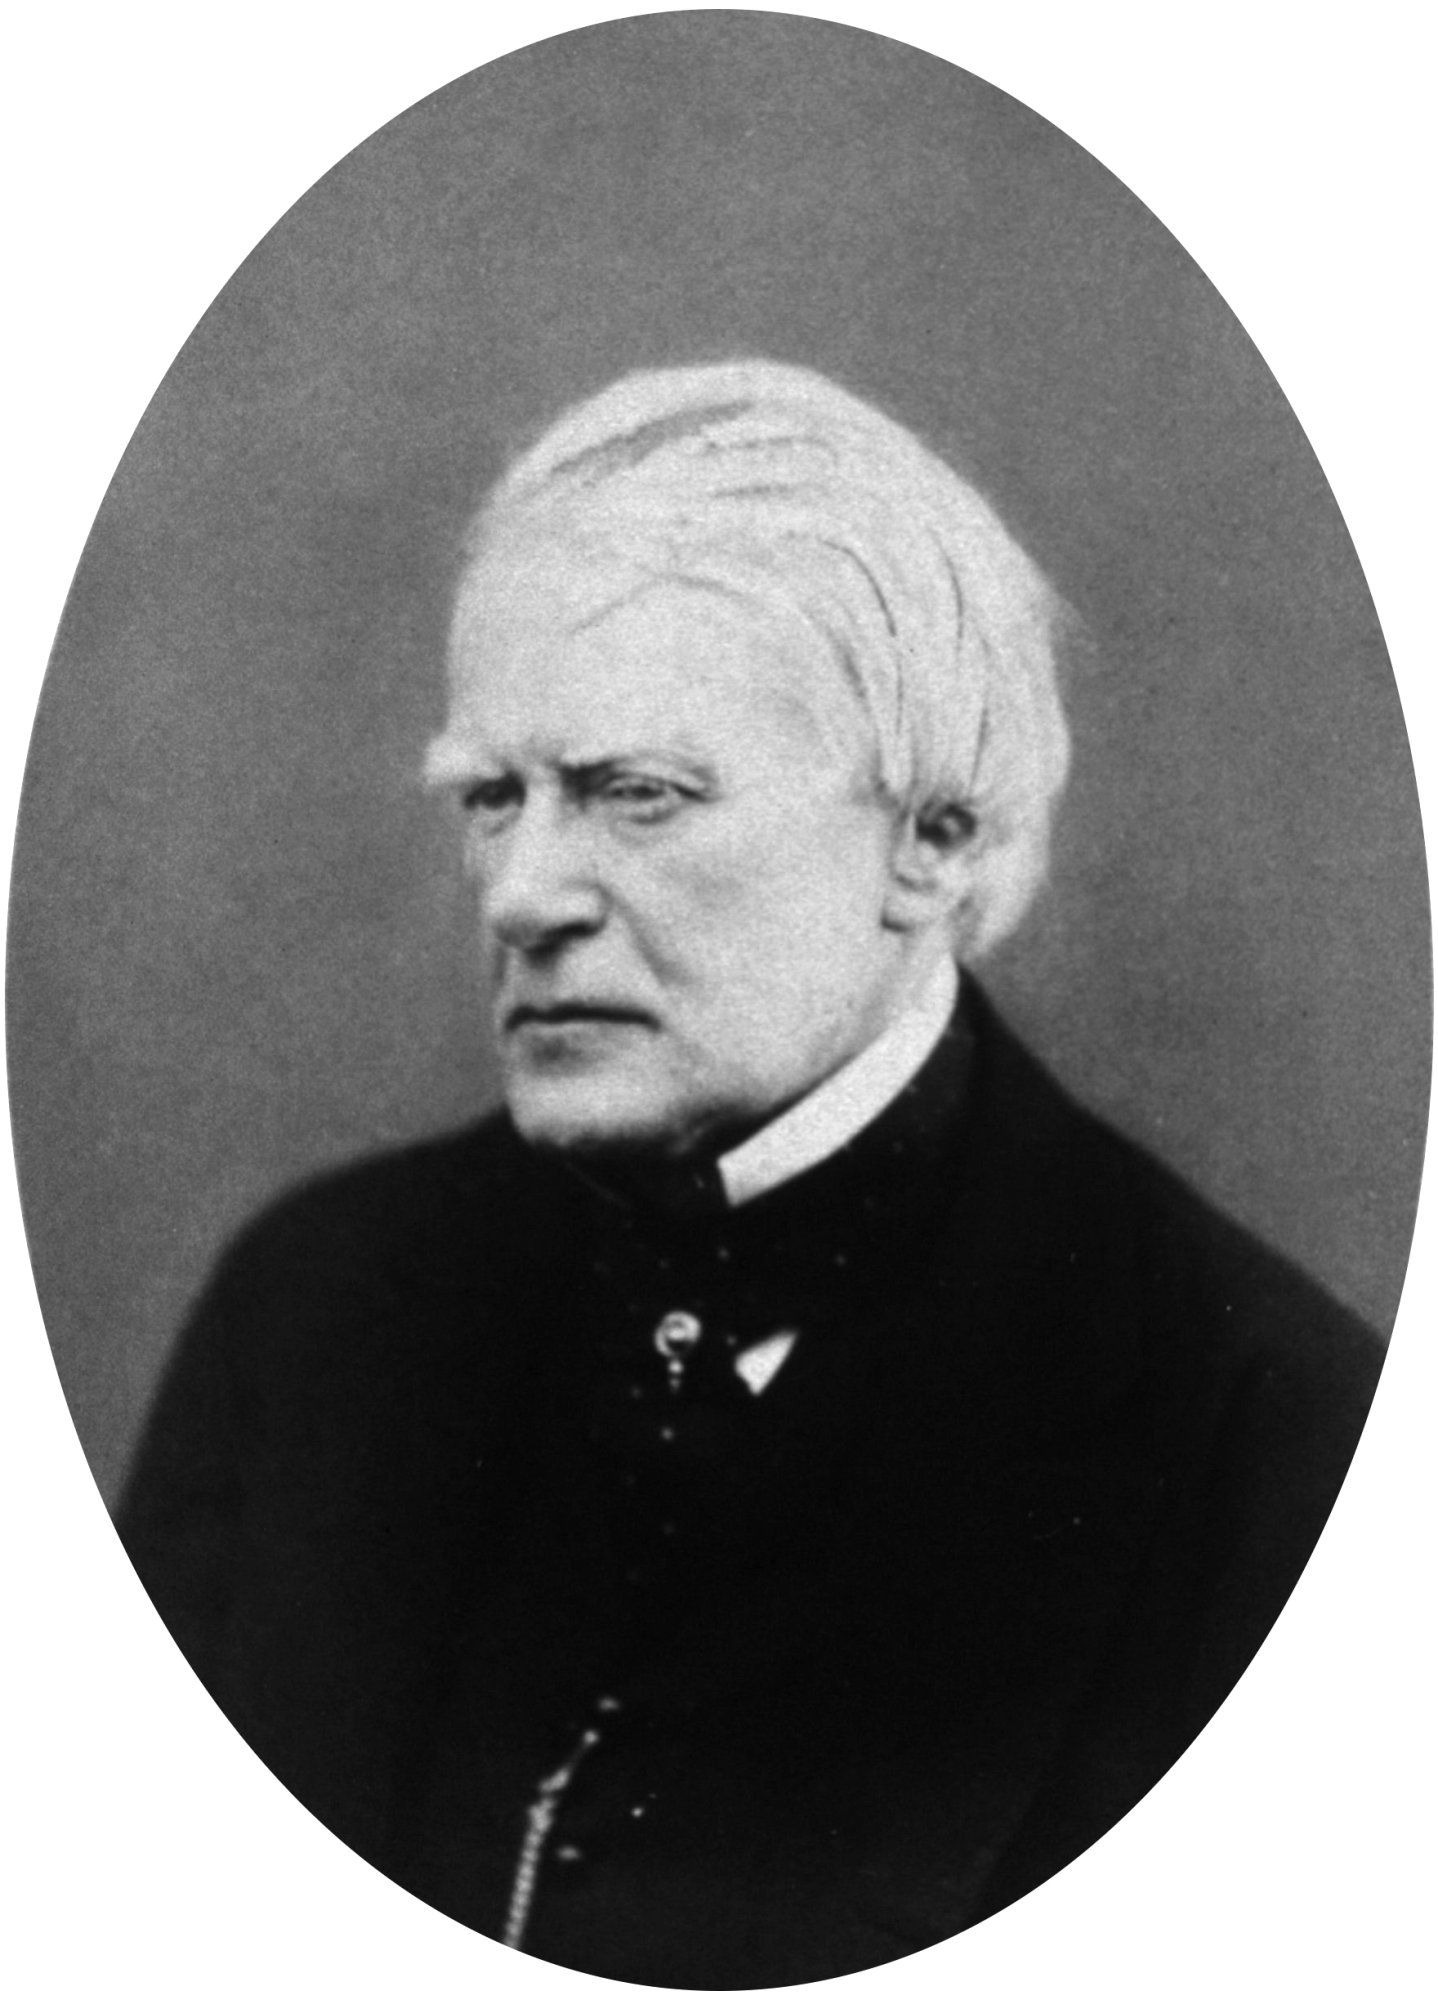 Richard Partridge in 1873